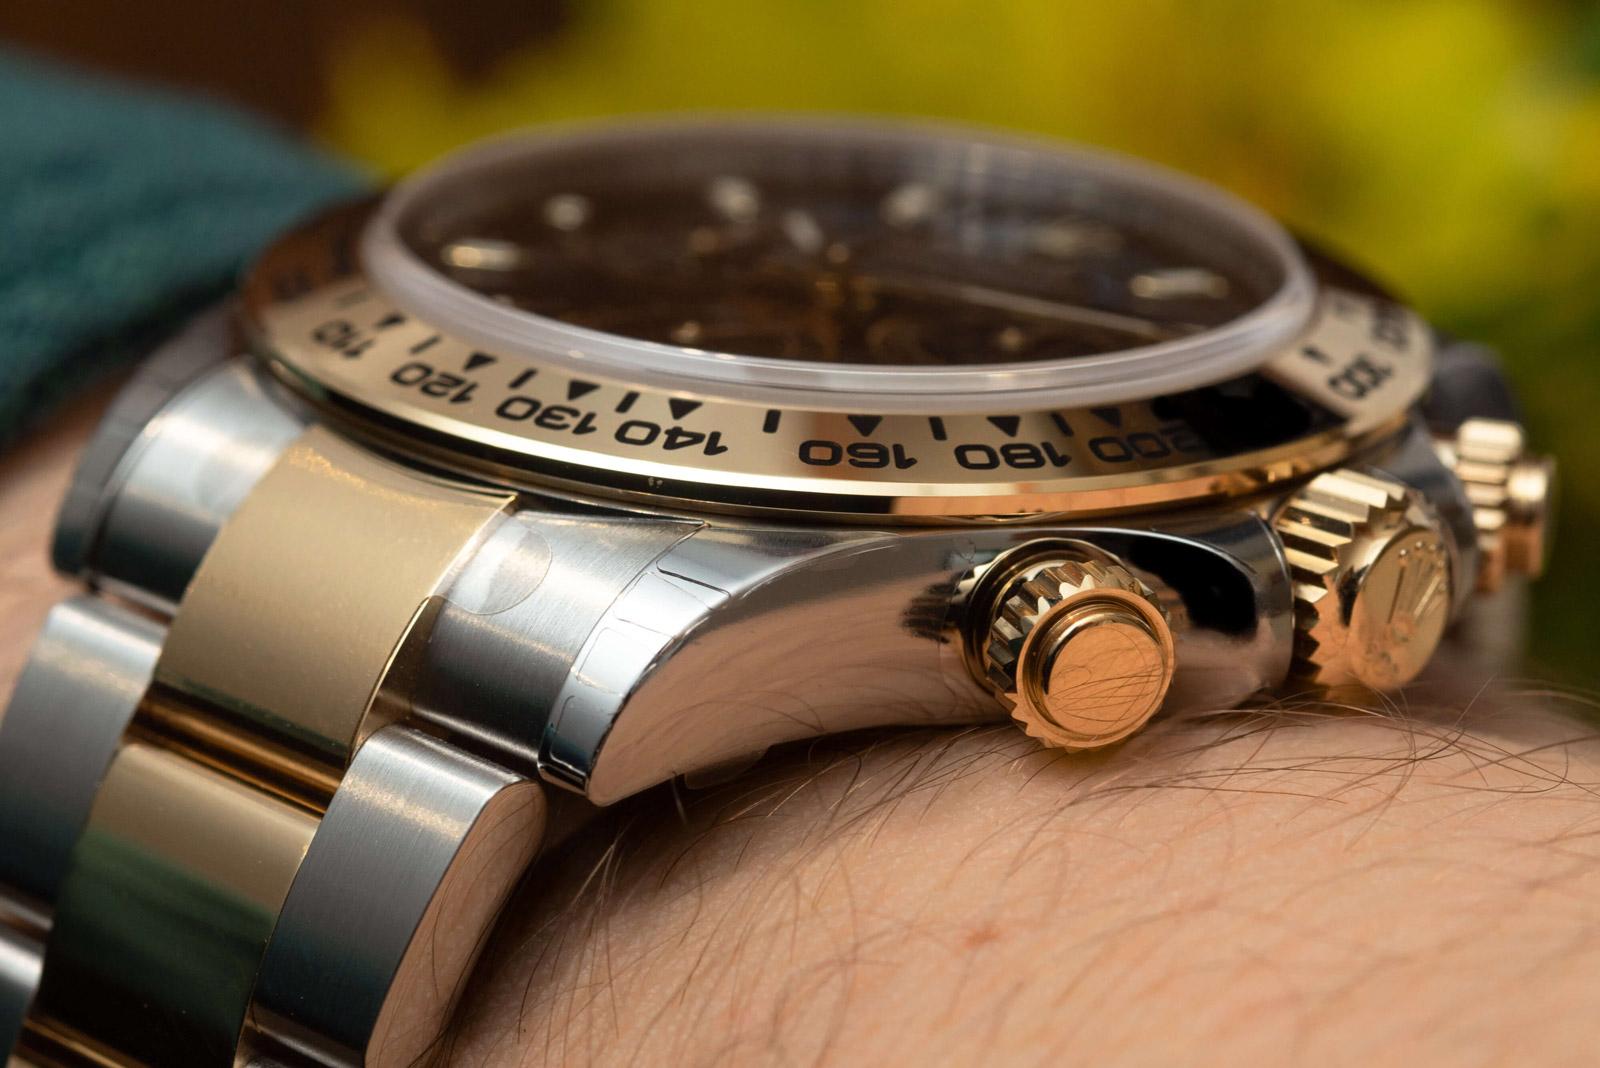 Rolex Cosmograph Daytona – Ref. 116503